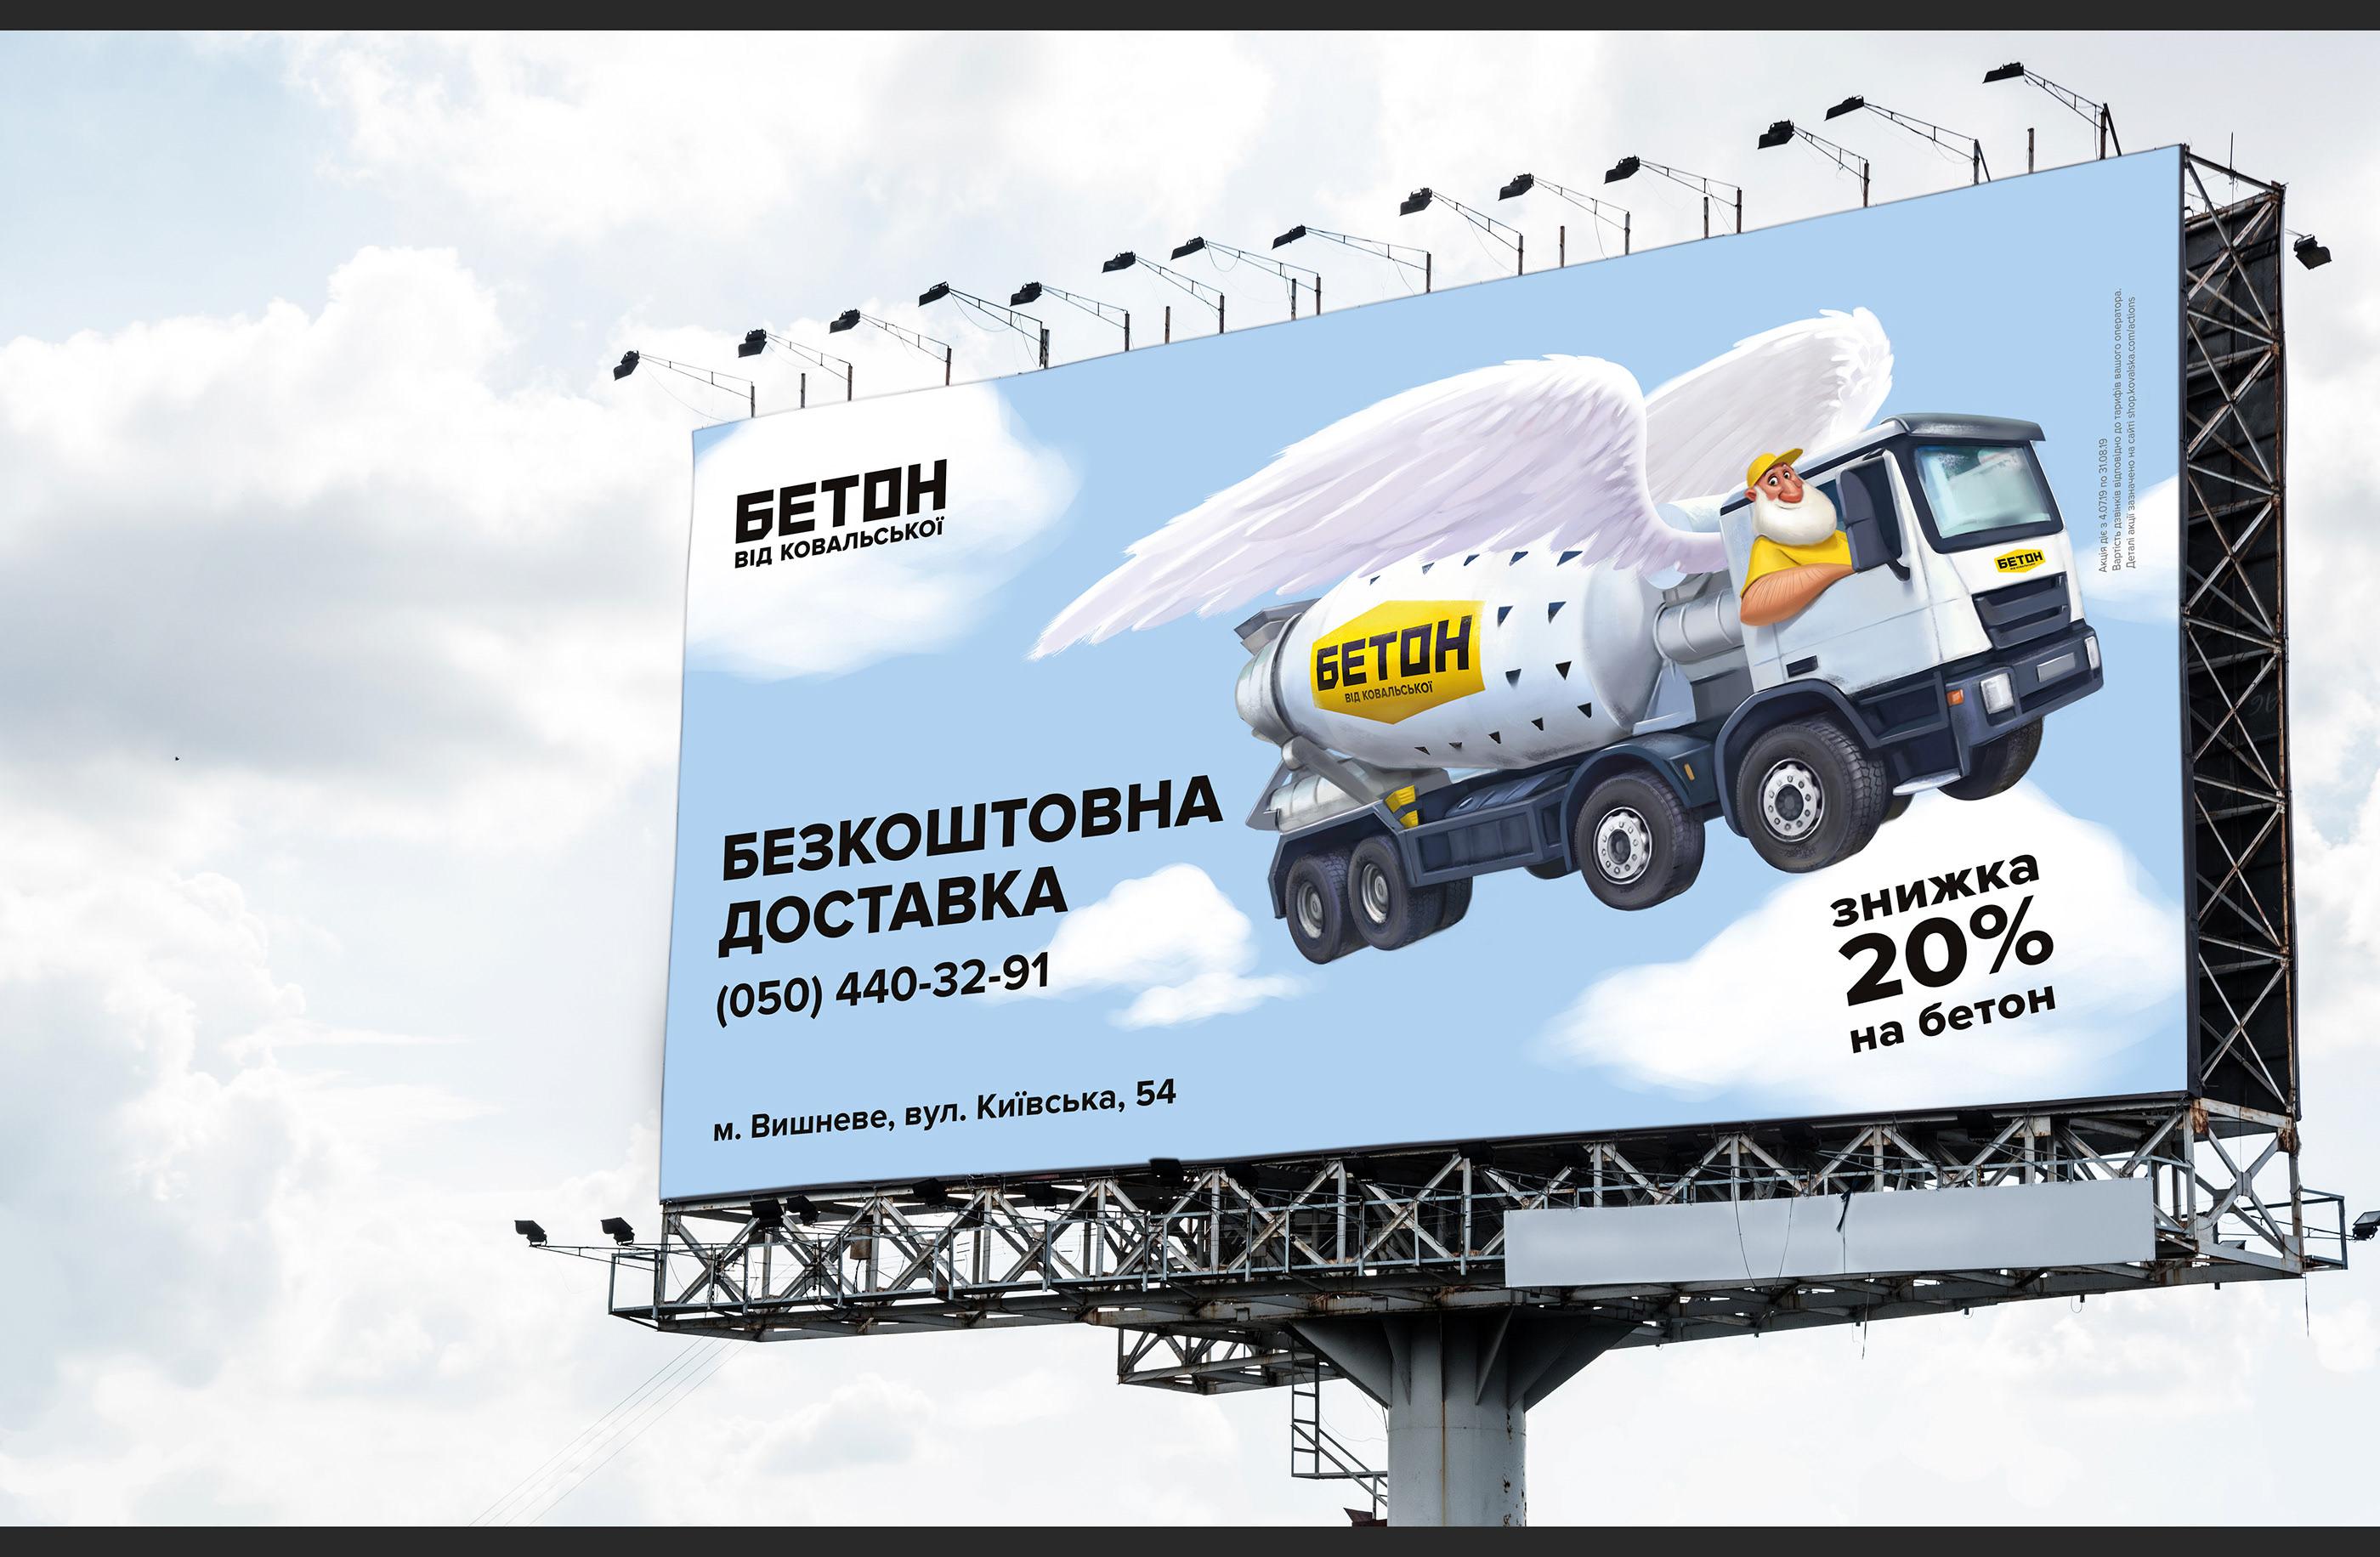 Реклама бетона сток из бетона